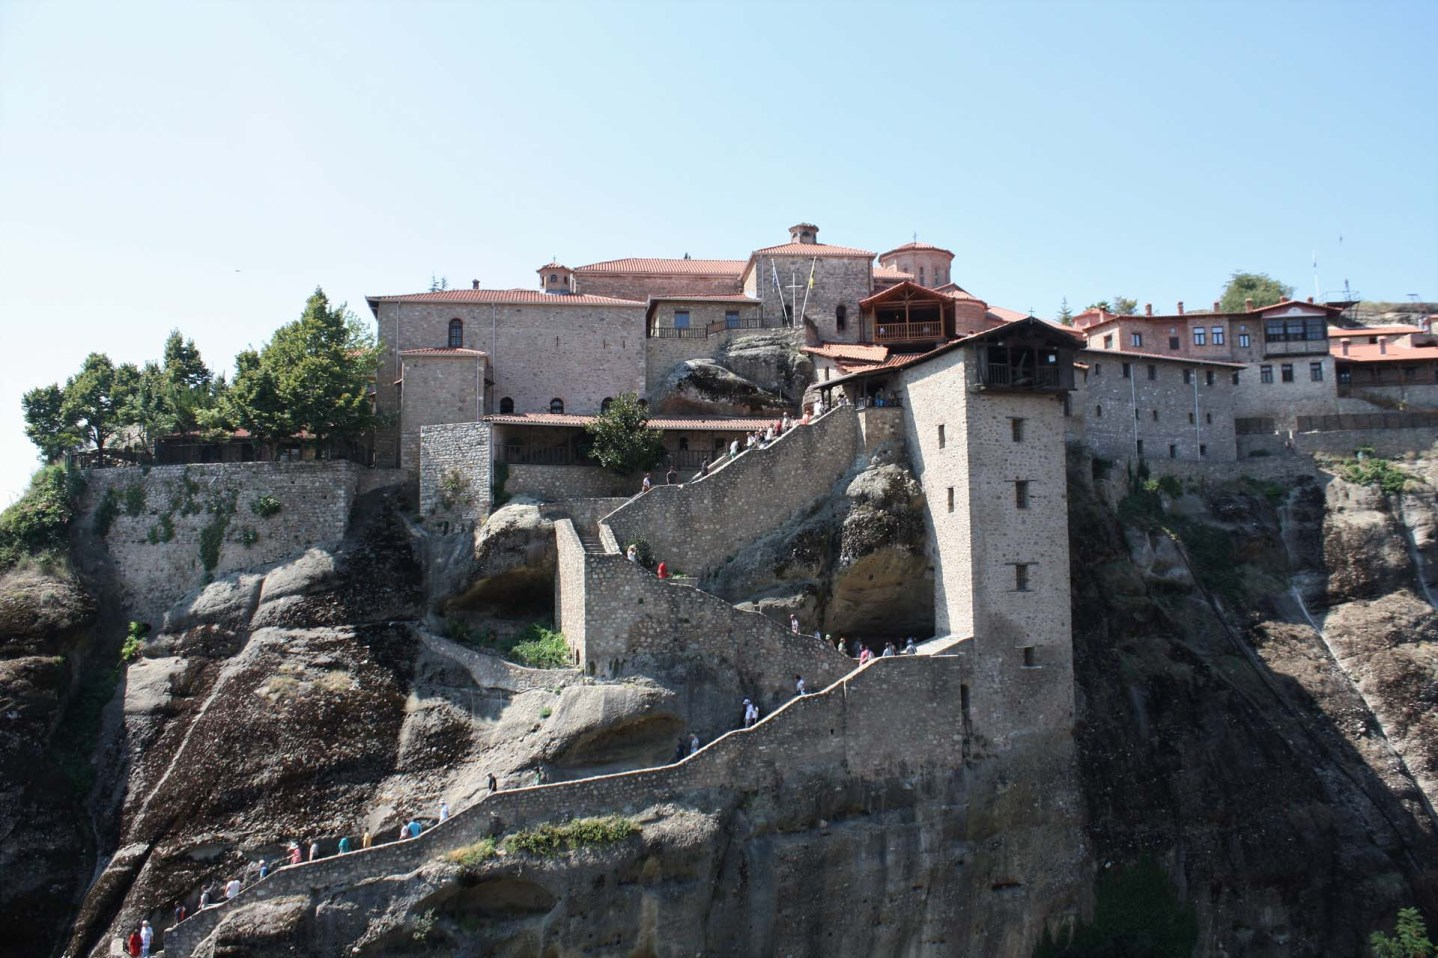 Monastère de la Transfiguration ou Grand Météore